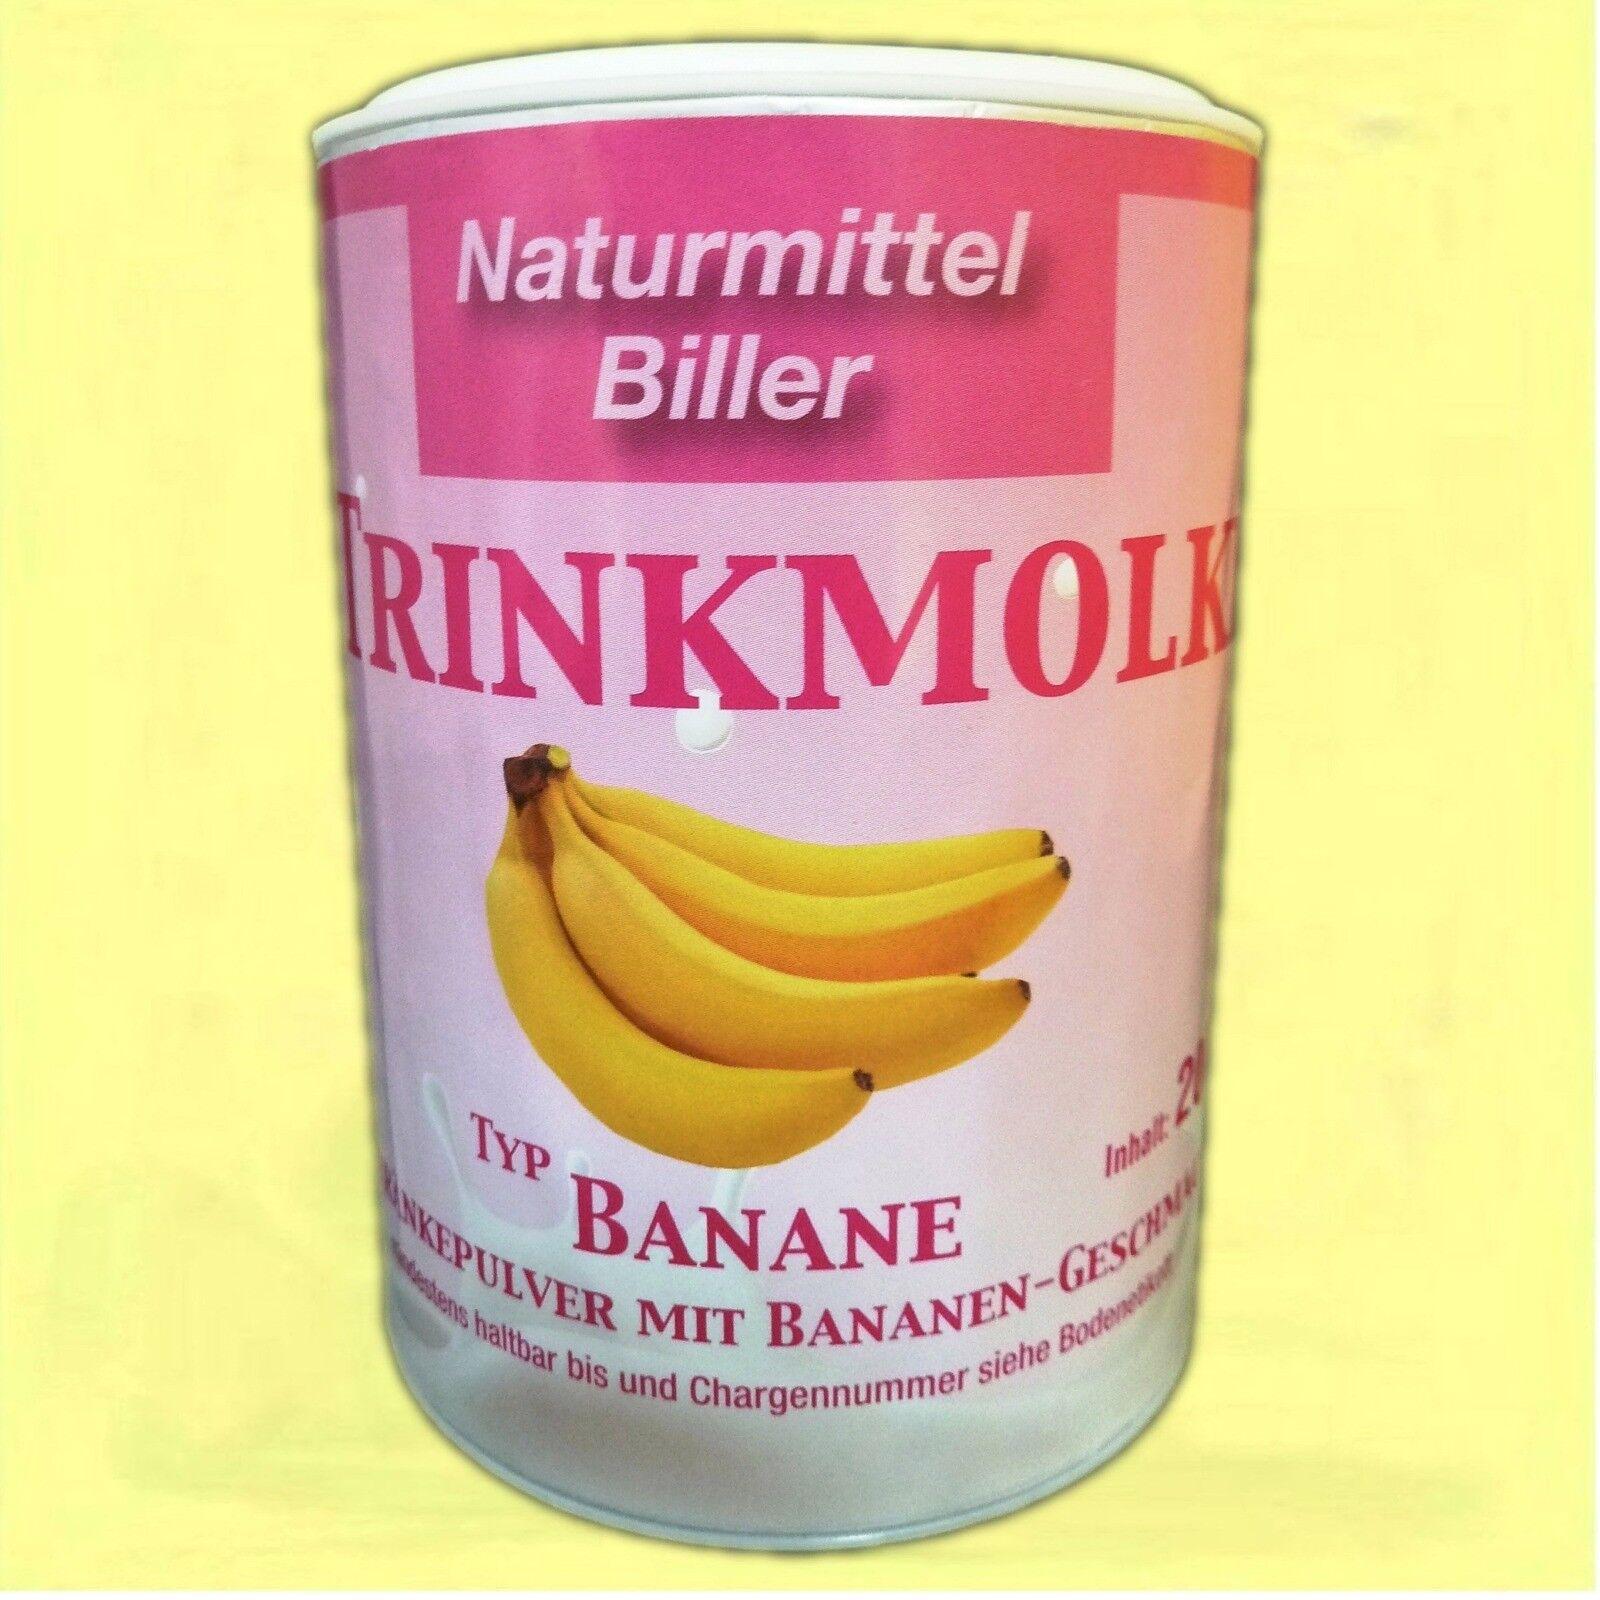 Trinkmolke Banane Biller Molkenpulver Diätdrink Molkeneiweiß Shake Slim 200gDose